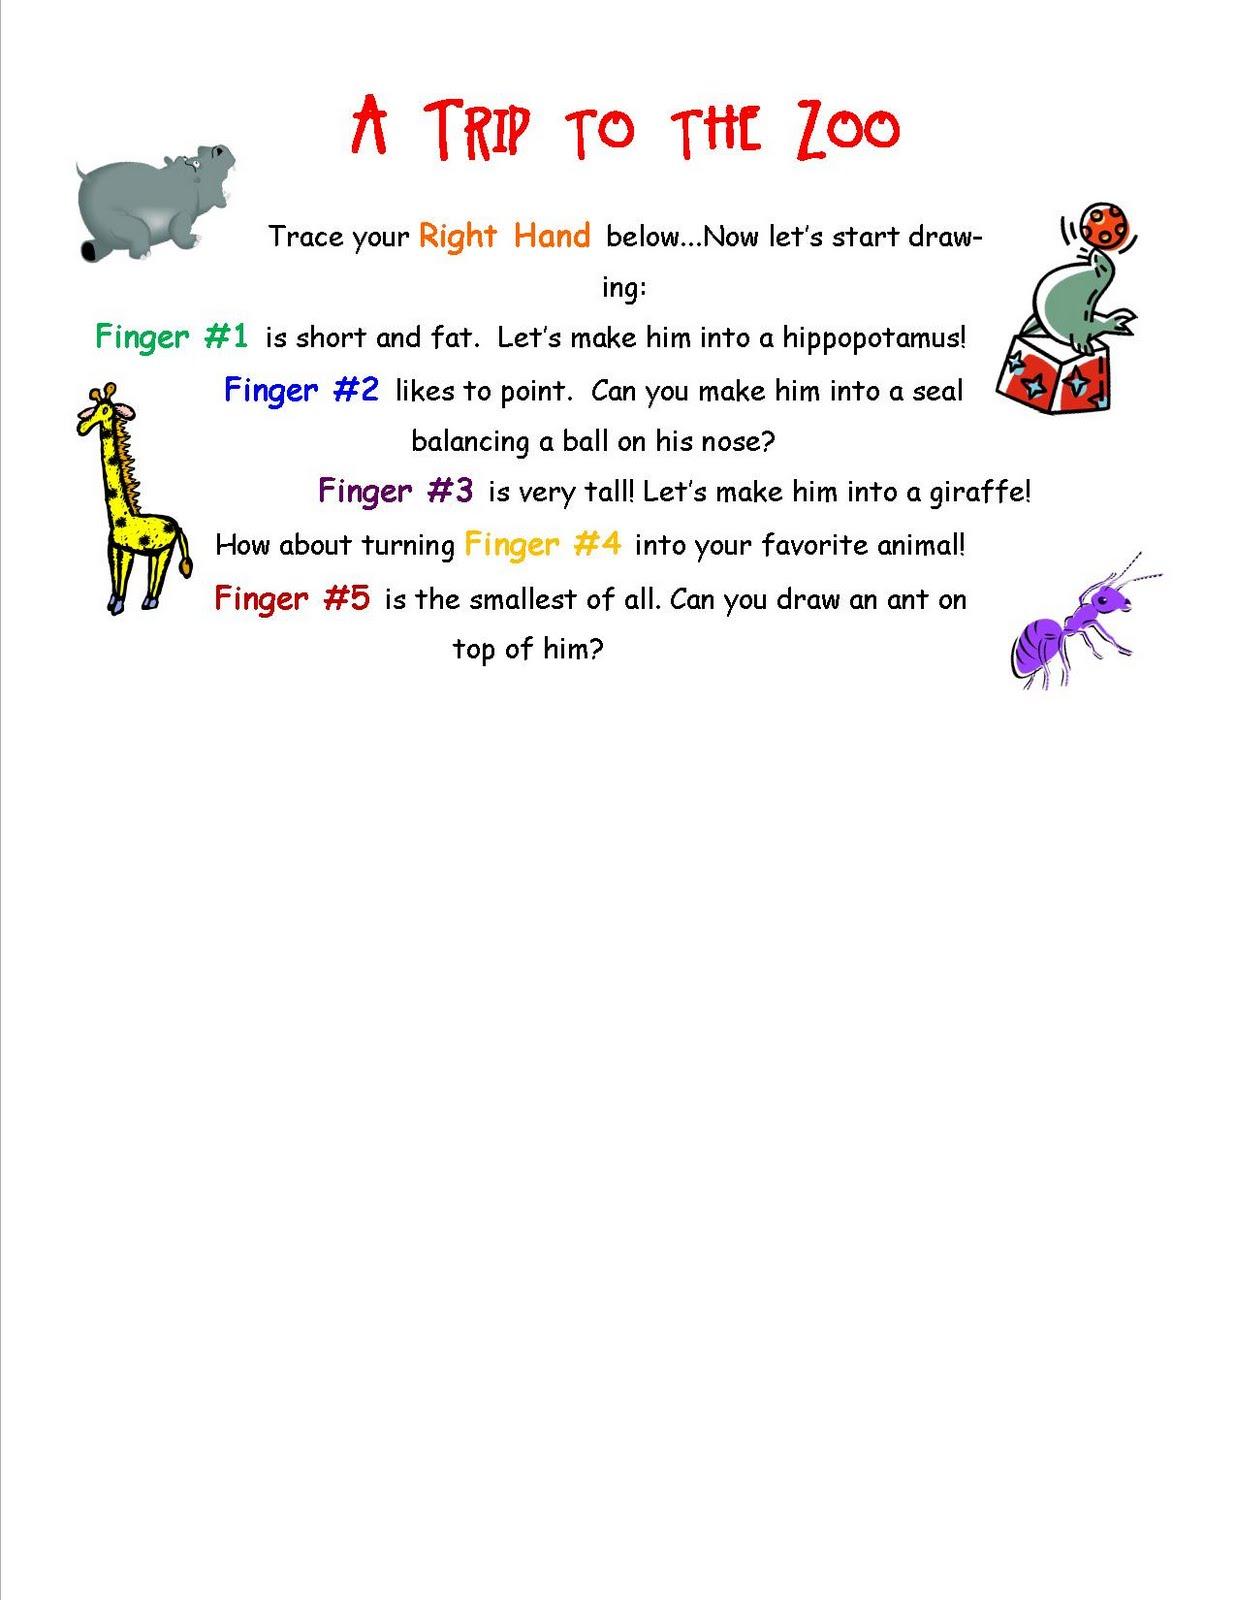 Discoveries Piano Studio Finger Number Worksheet